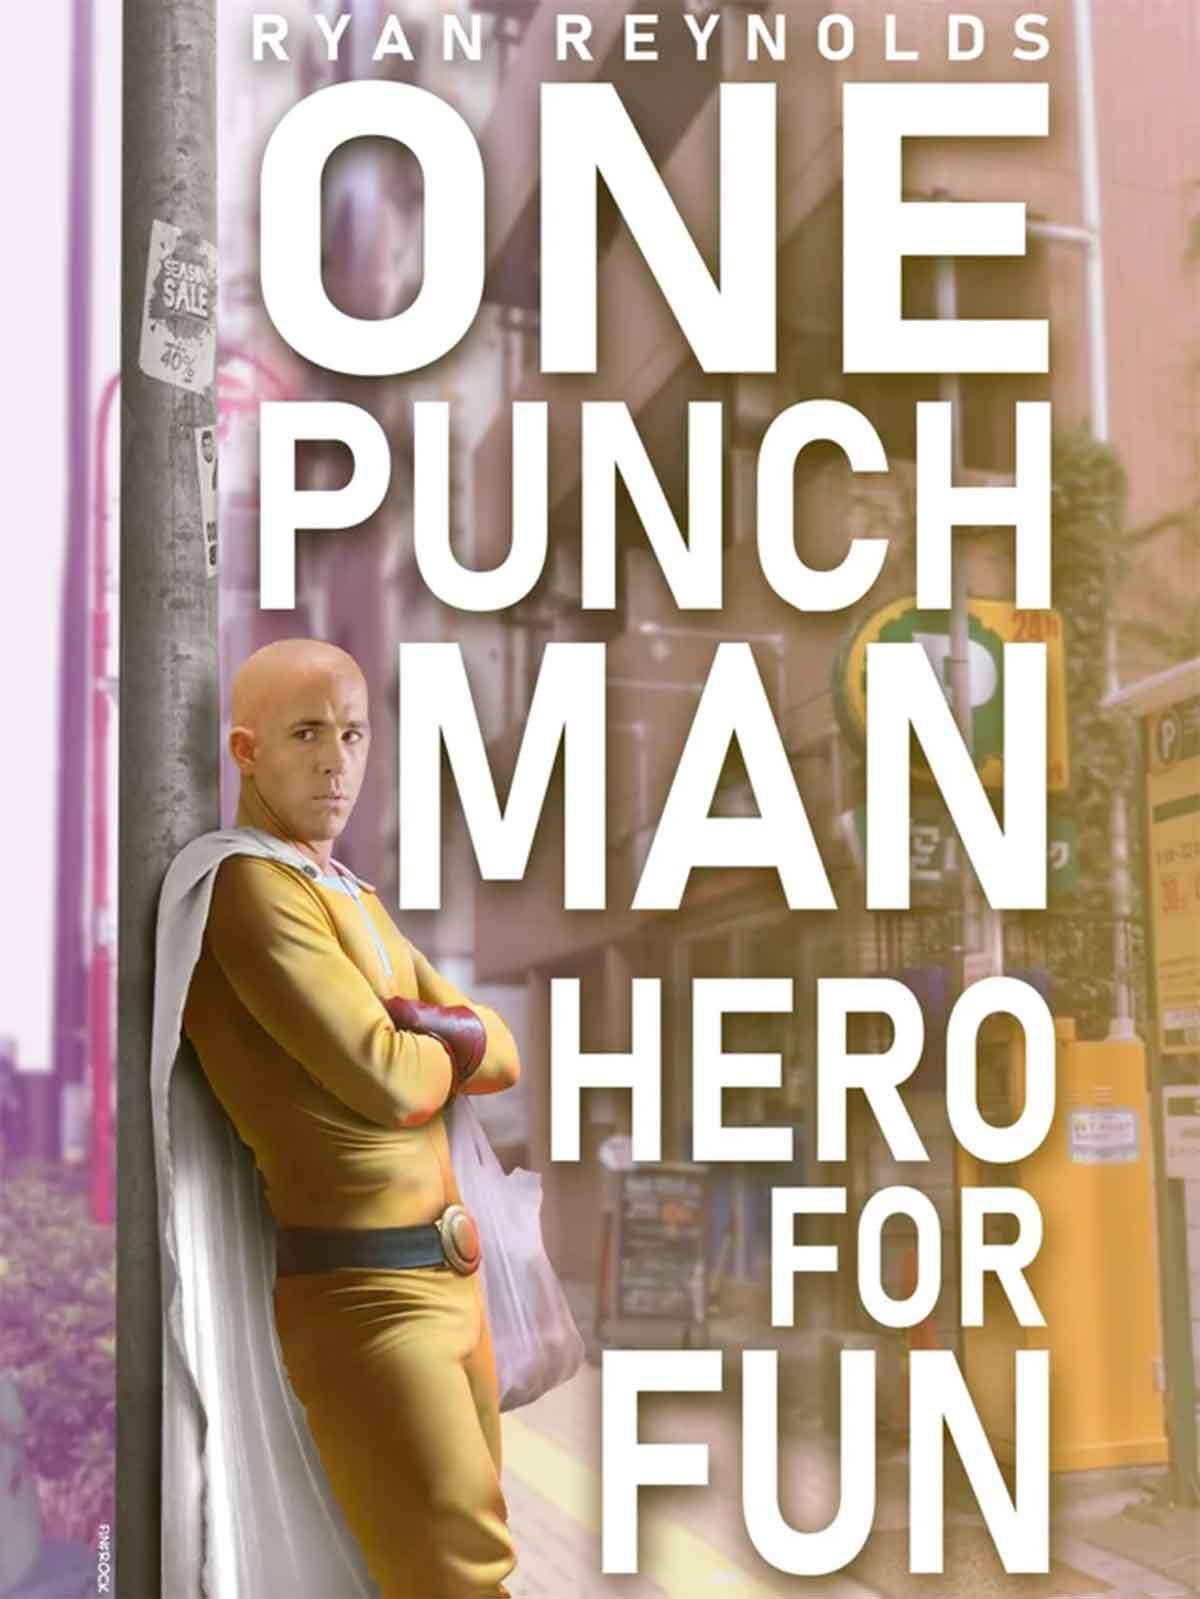 Espectacular Fan Art de One-Punch Man de acción real con Ryan Reynolds como Saitama